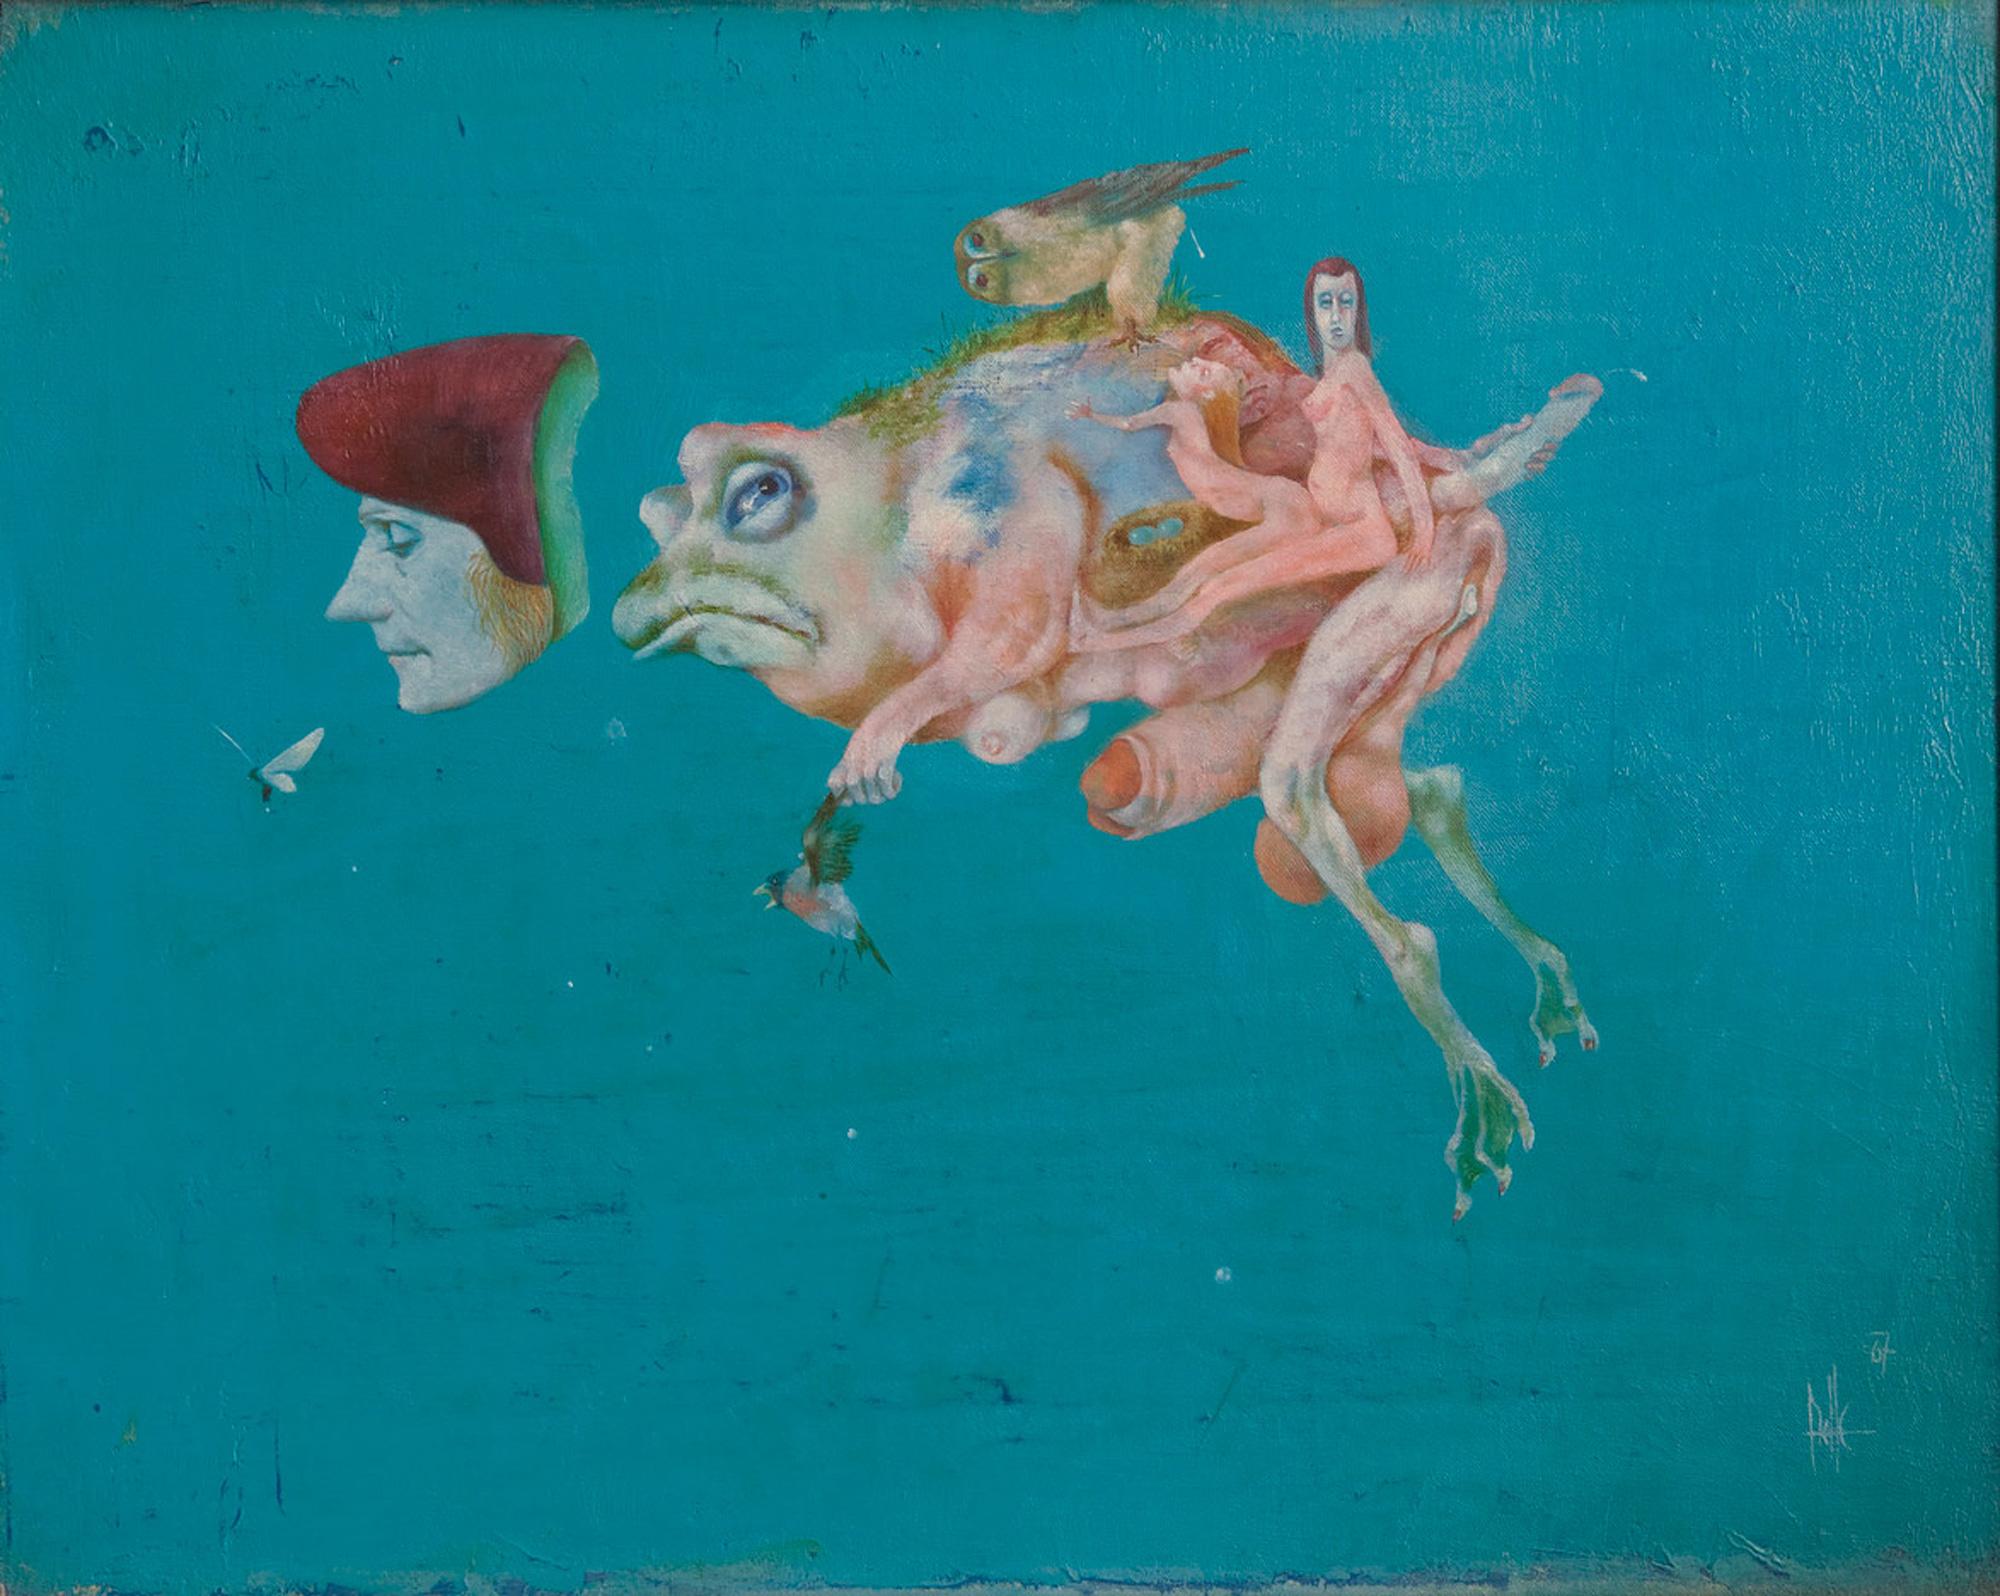 Melle schilder | Pipa met Erasmus, olieverf op linnen